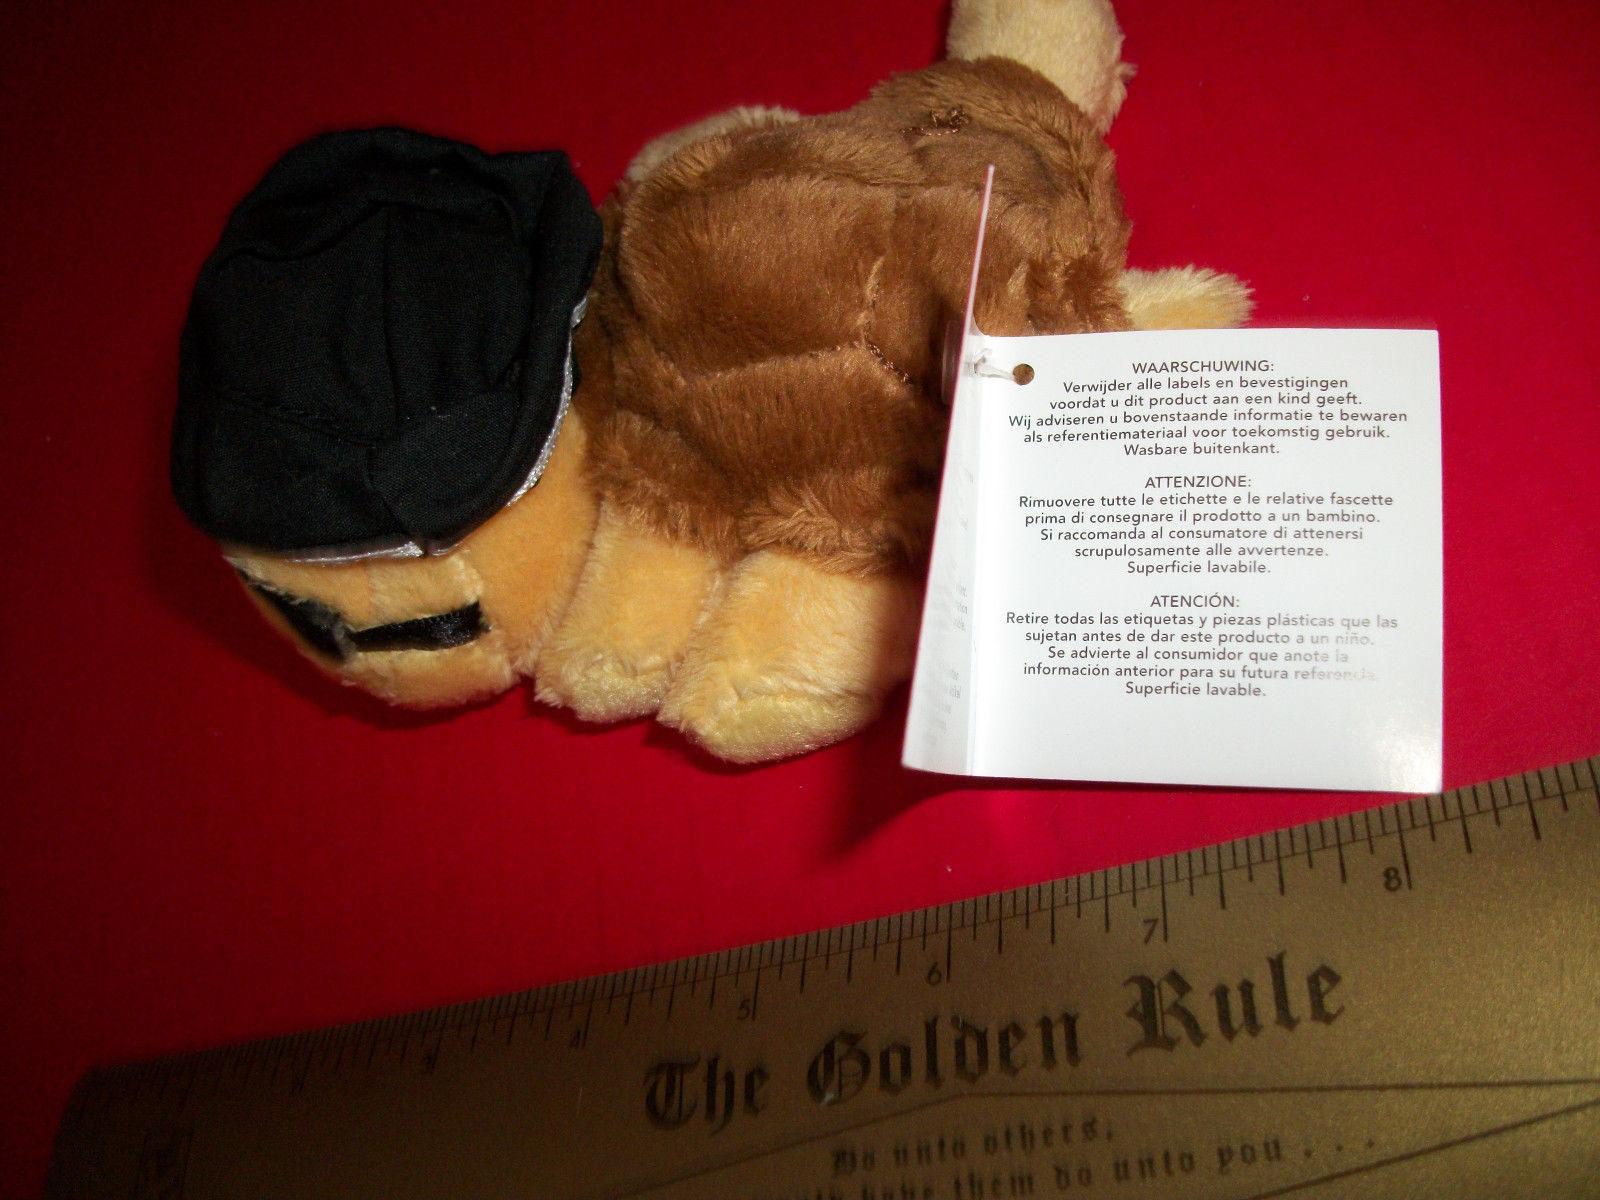 Toy Gift Russ Plush Shelly Small Pirate Turtle Stuffed Animal Yellow Eye Patch